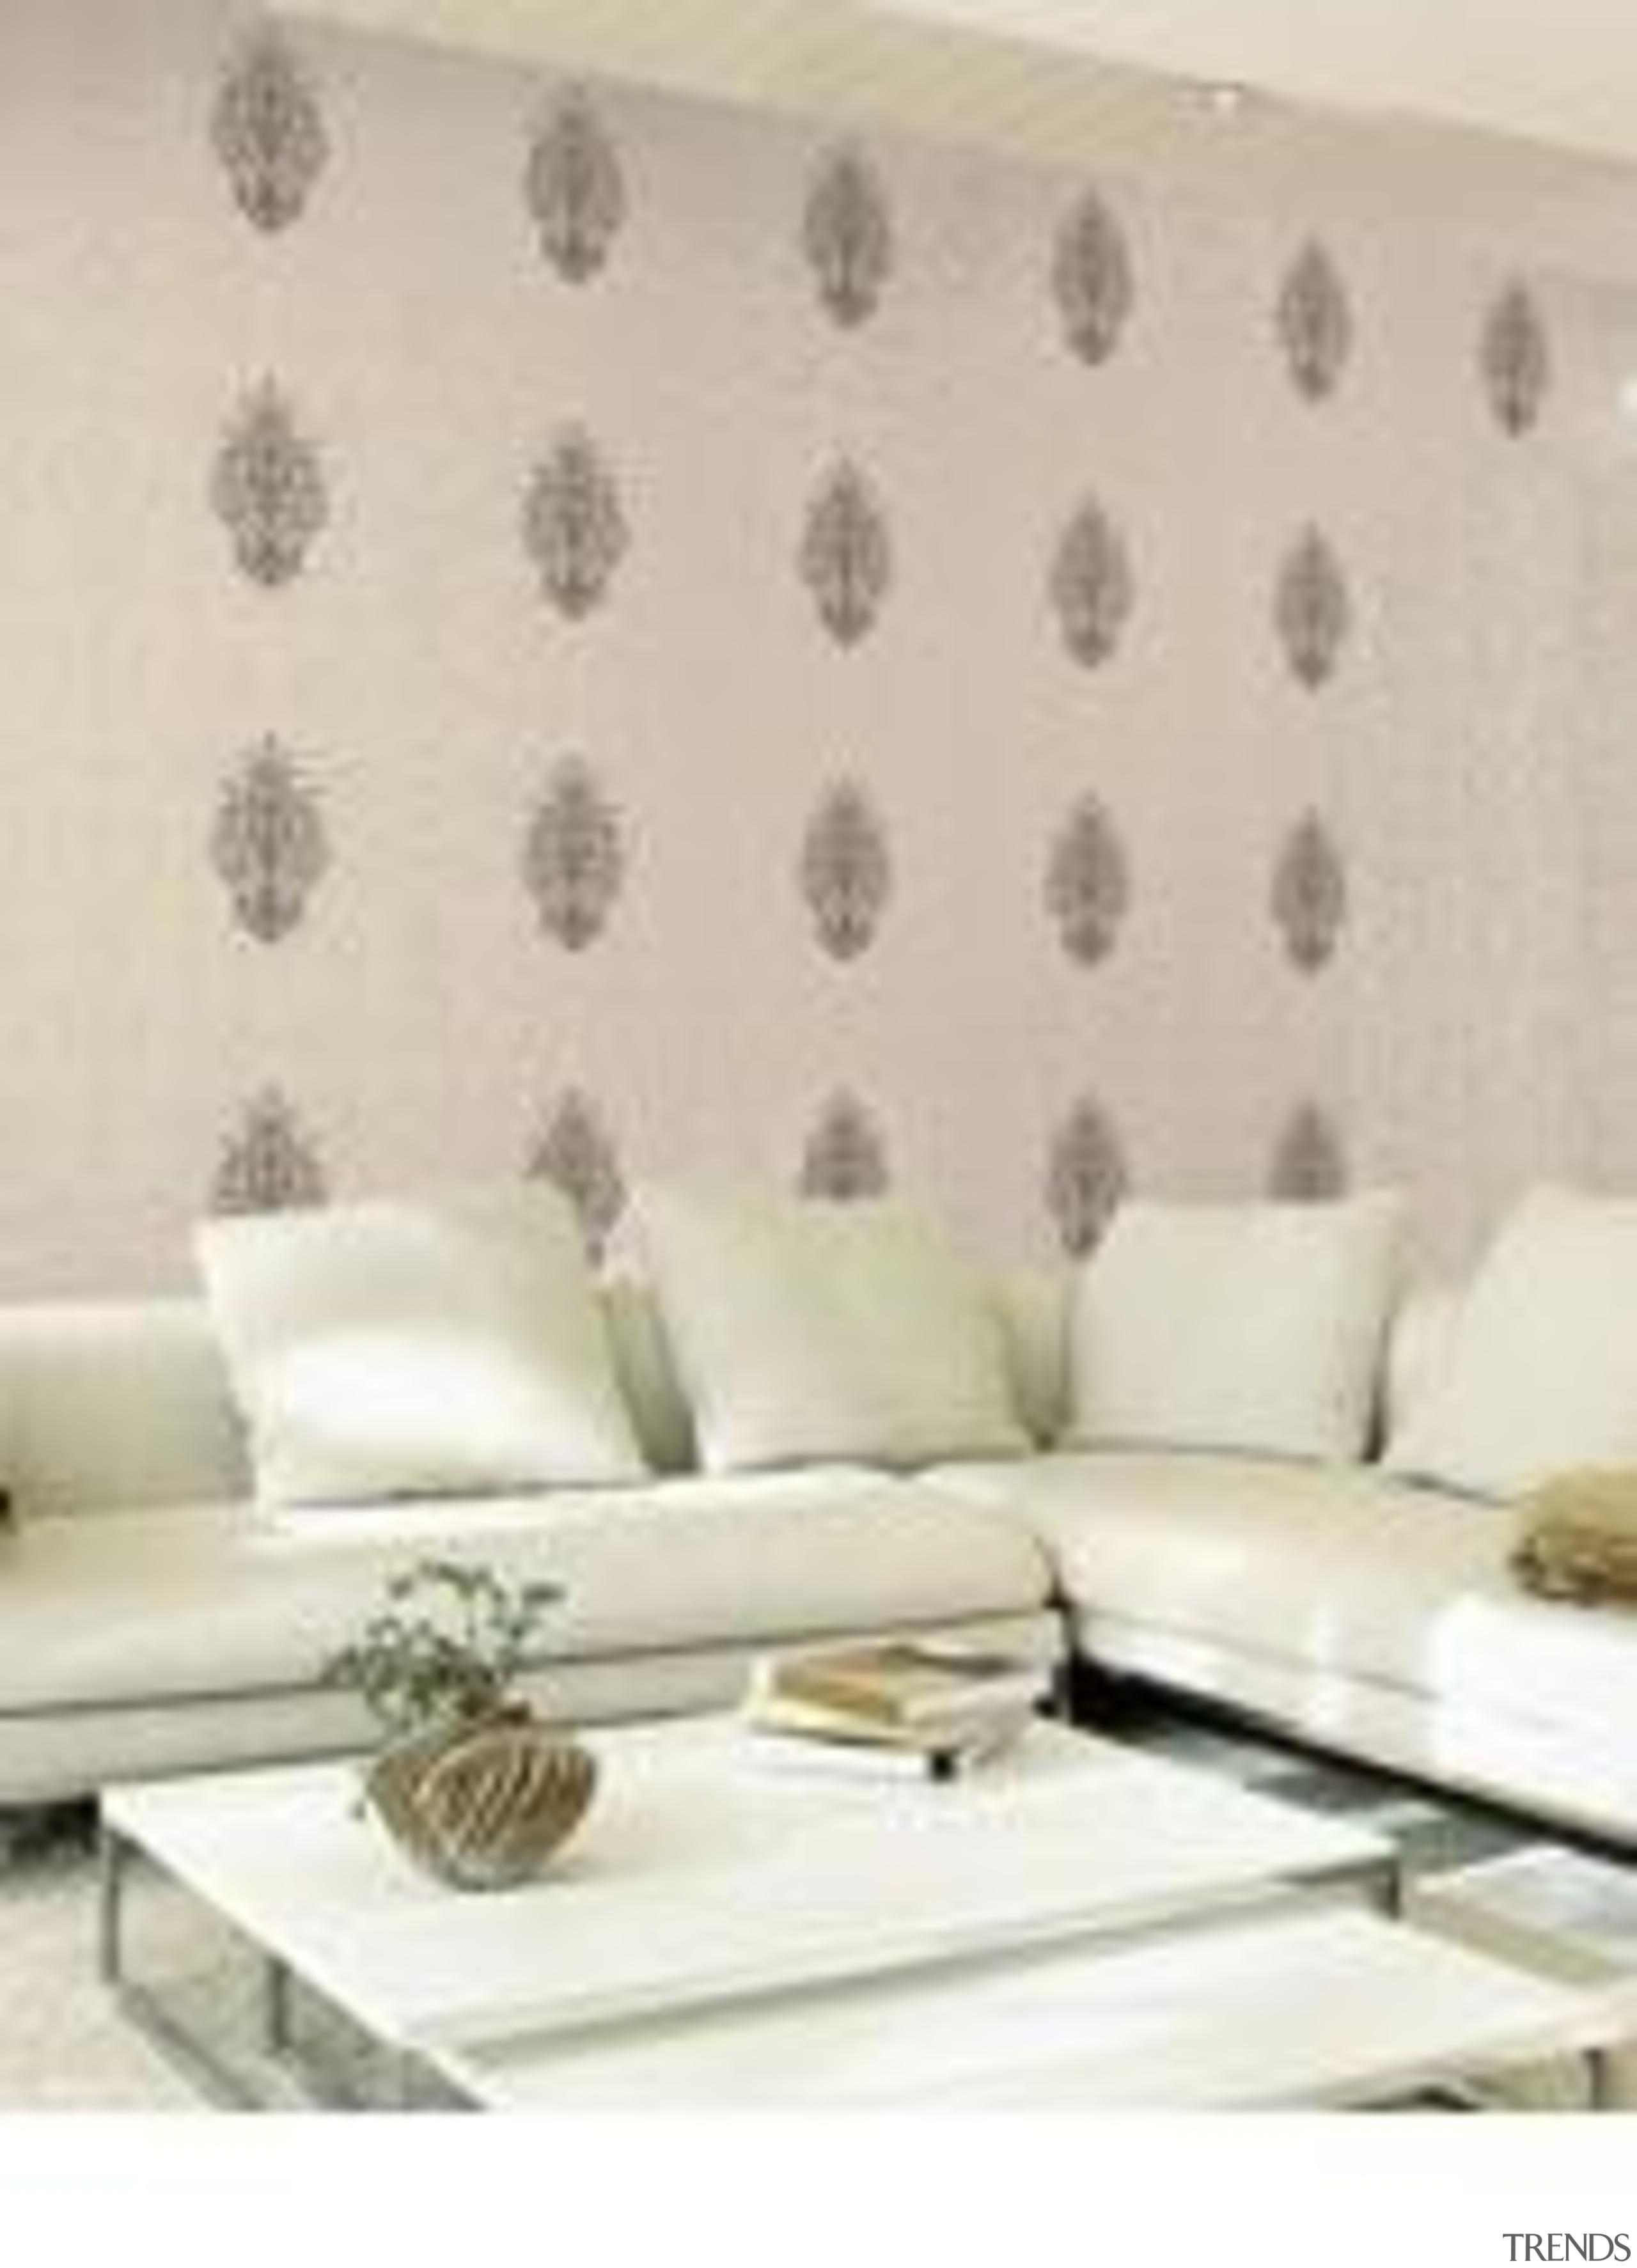 Carillon Range - Carillon Range - angle | angle, couch, decor, floor, furniture, interior design, living room, loveseat, sofa bed, table, wall, wallpaper, window covering, white